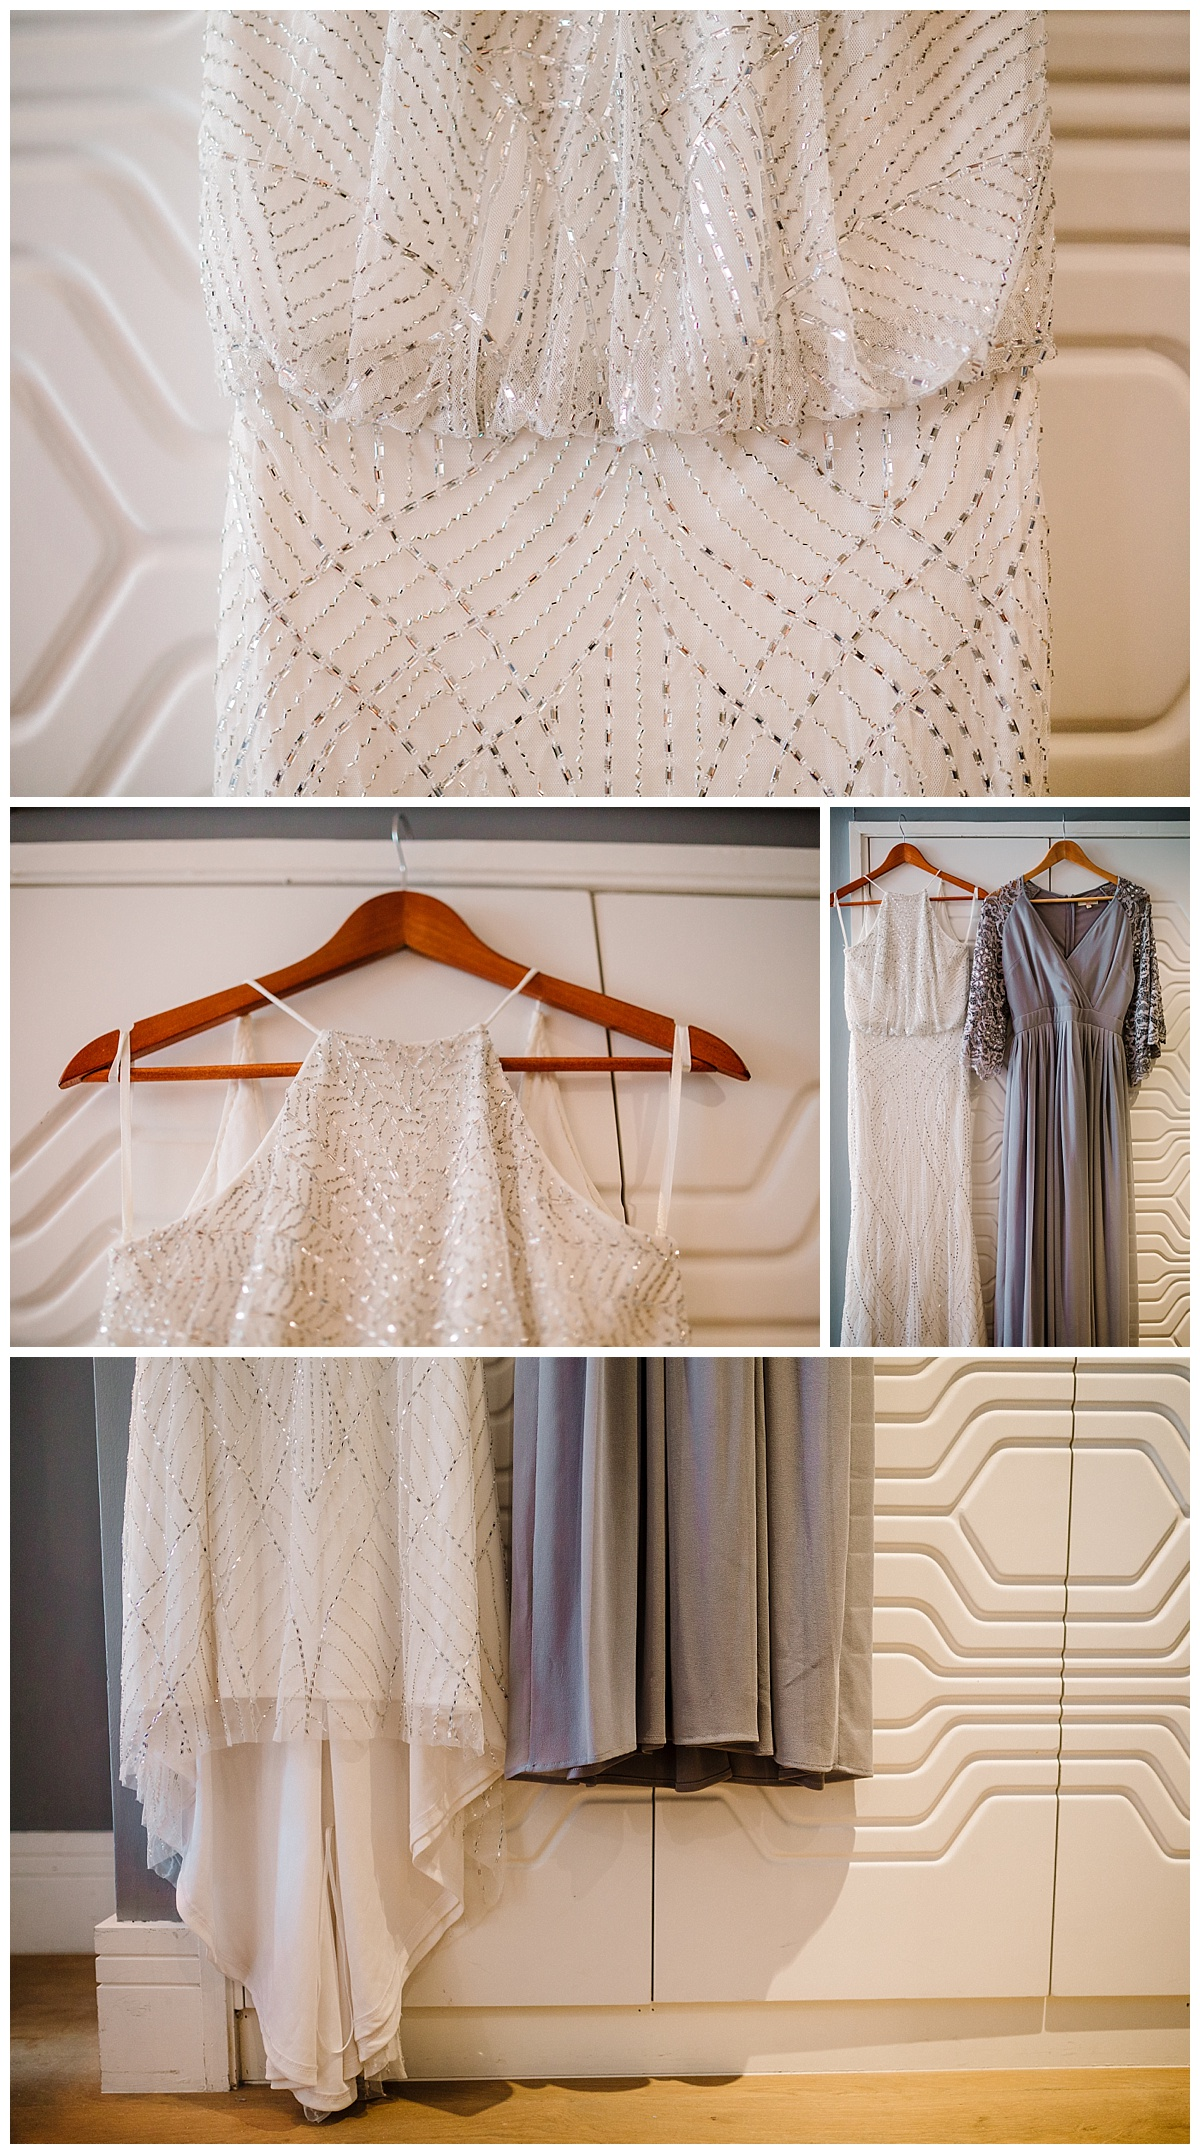 Wedding dress and bridesmaid dress hanging on wardrobe in hotel room